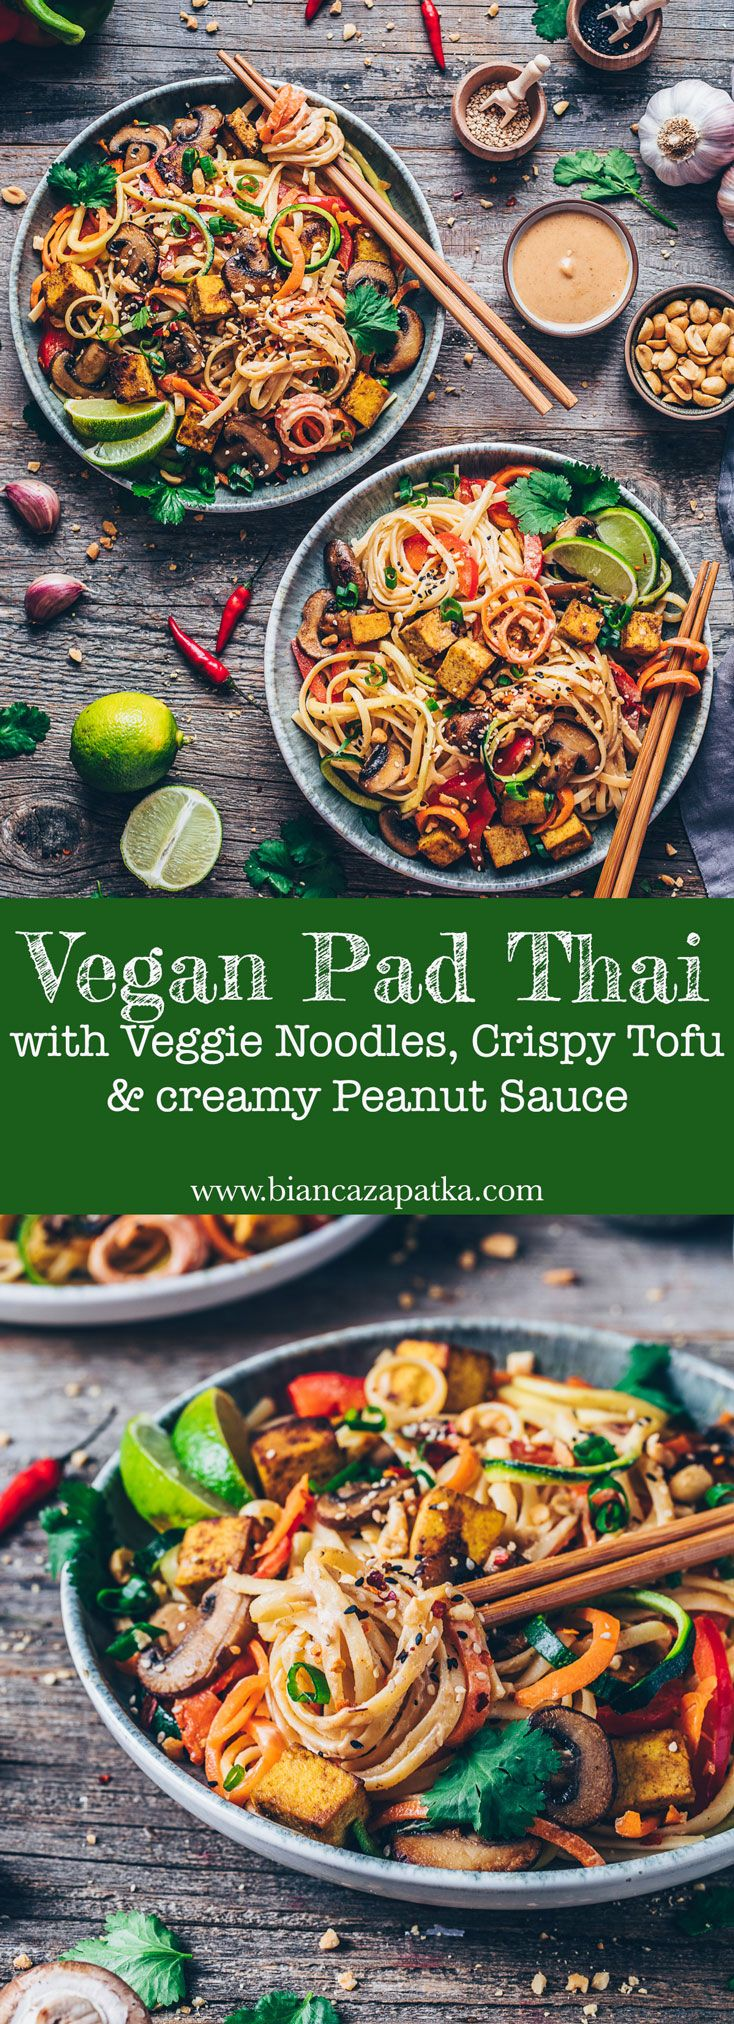 Vegan Pad Thai with Veggie Noodles & Tofu – Bianca Zapatka   Recipes